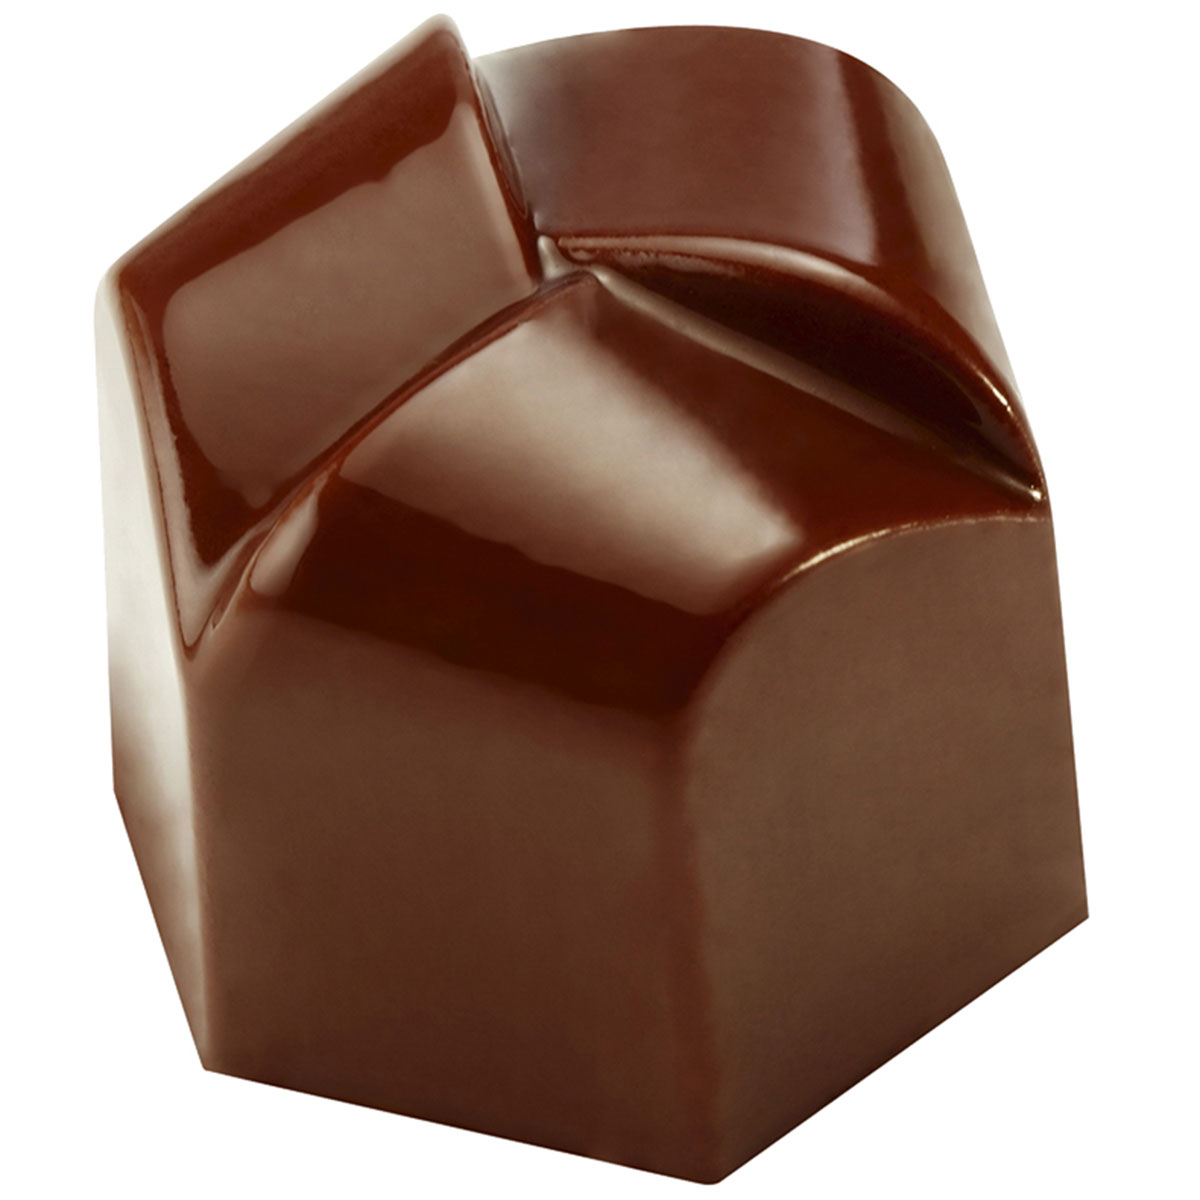 Billede af H. W. Larsen chokoladeform - Pavoni - Model 8PC15